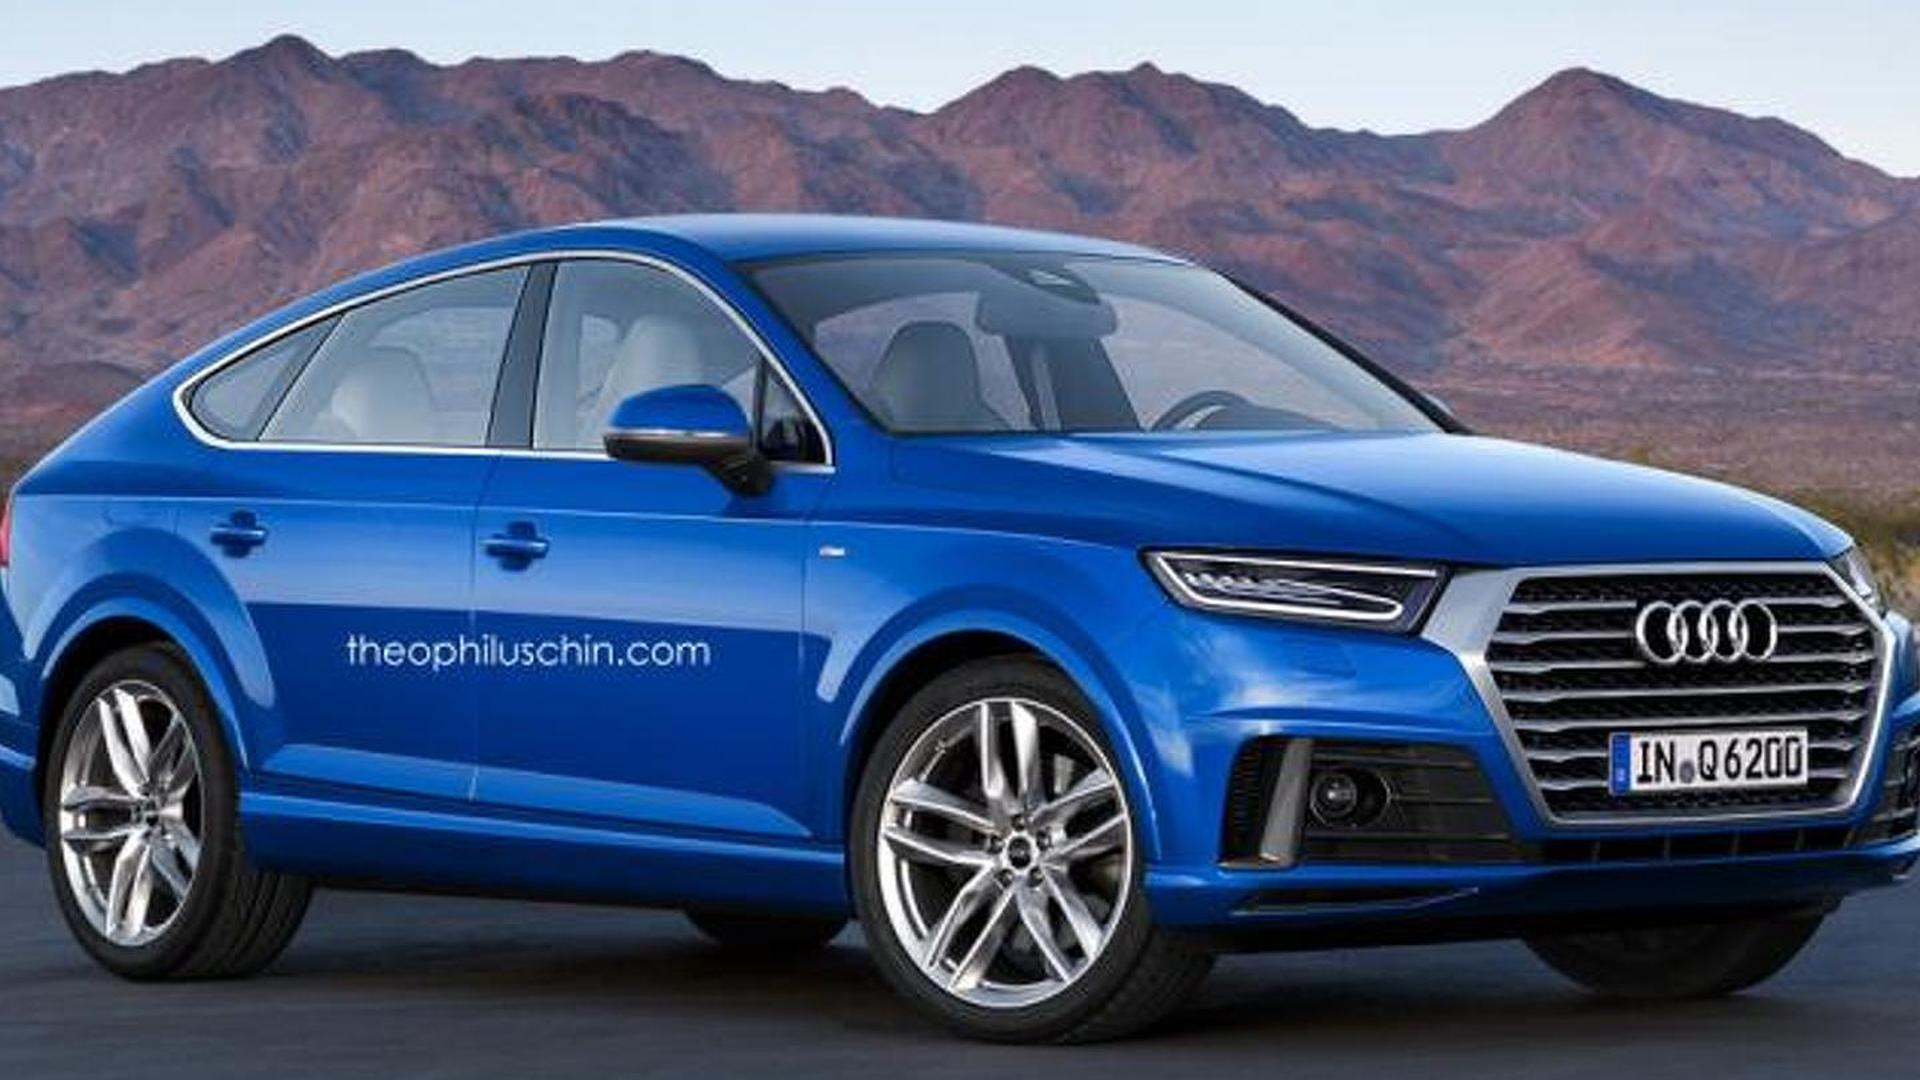 Kekurangan Audi X6 Top Model Tahun Ini